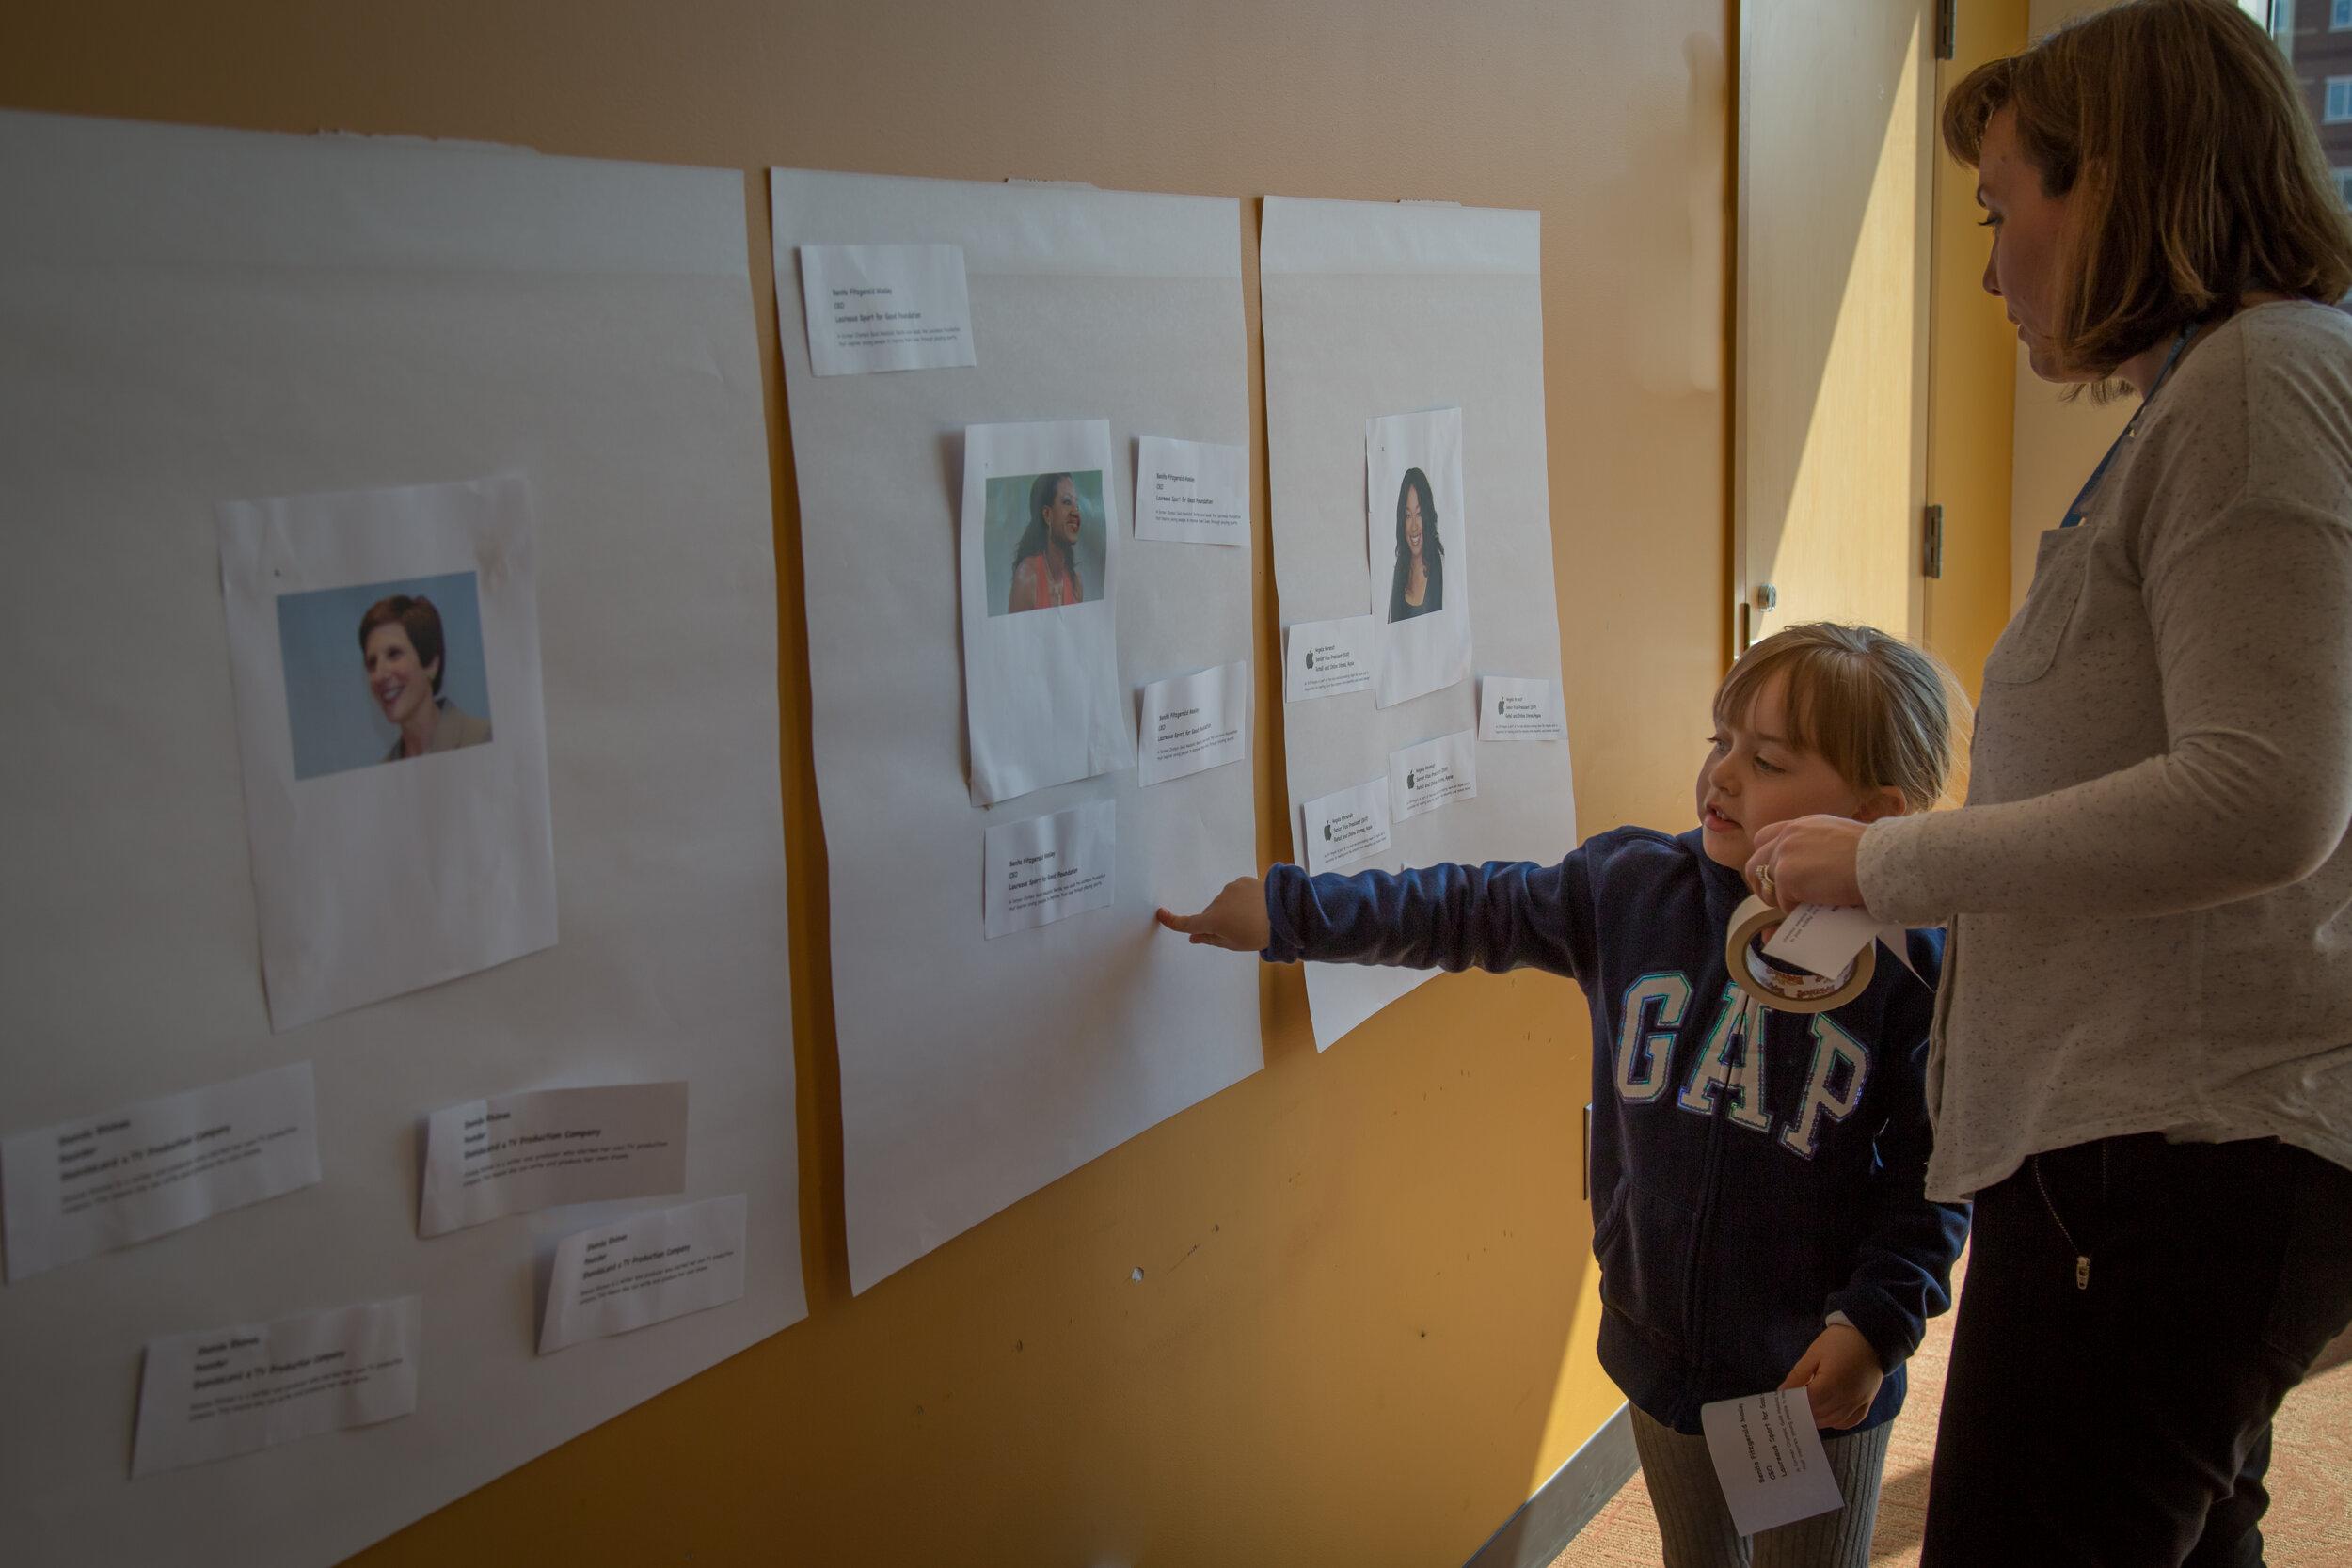 Entrepreneurship - Fosters girls' entrepreneurial spirits and help them see themselves as entrepreneurs